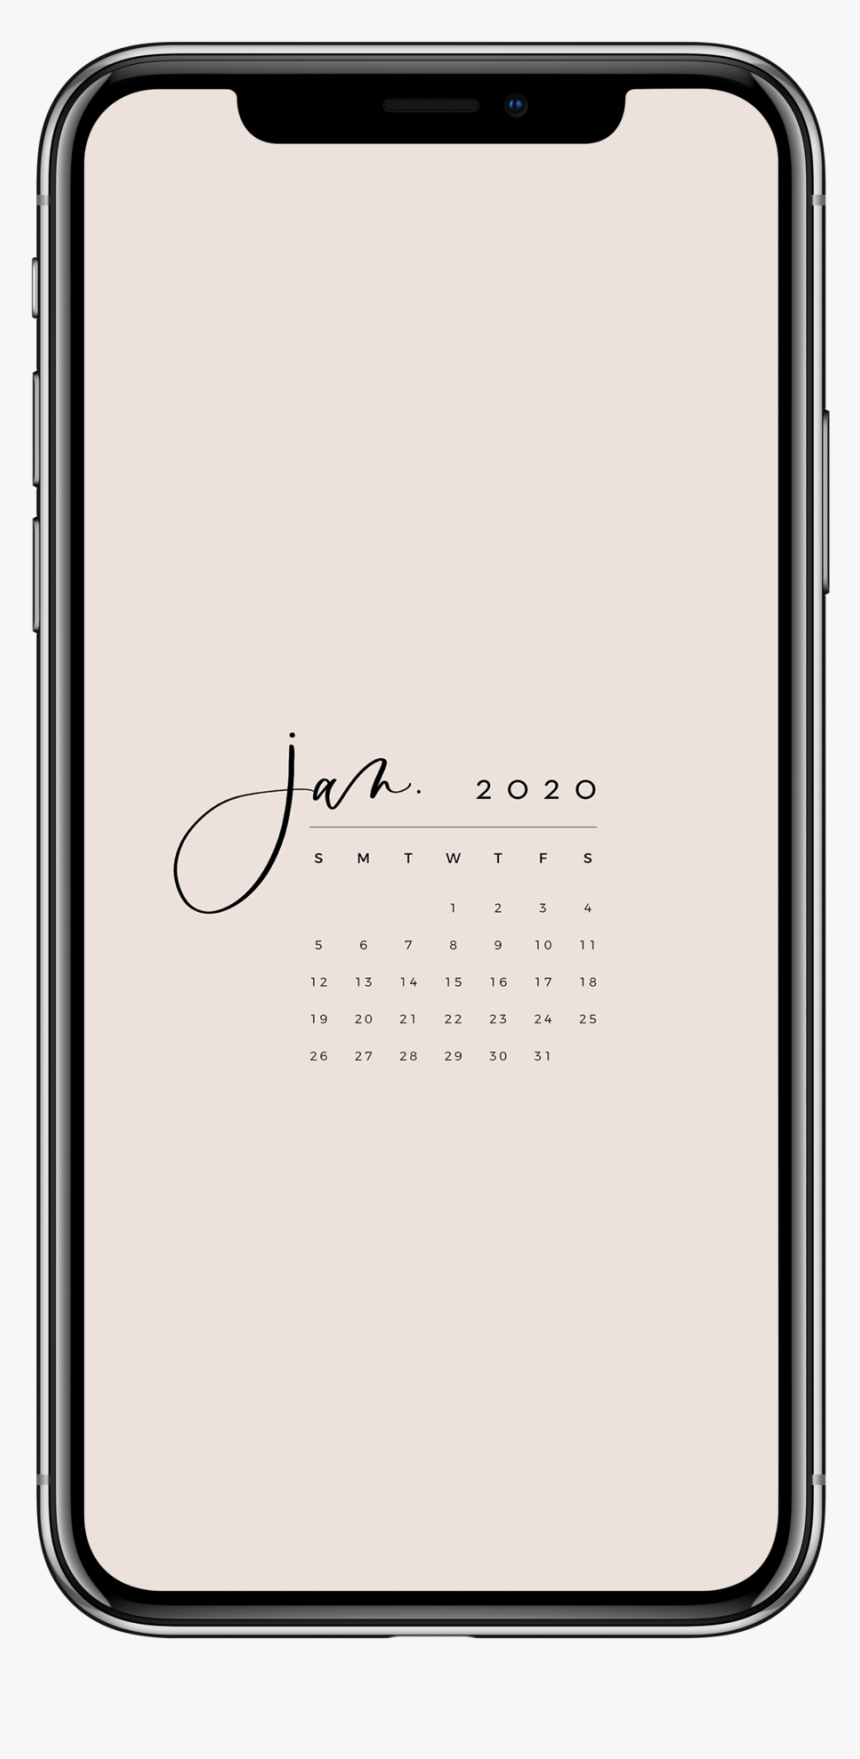 Jan2020 Iphone X Mockup - Flutter Instagram Clone, HD Png Download, Free Download